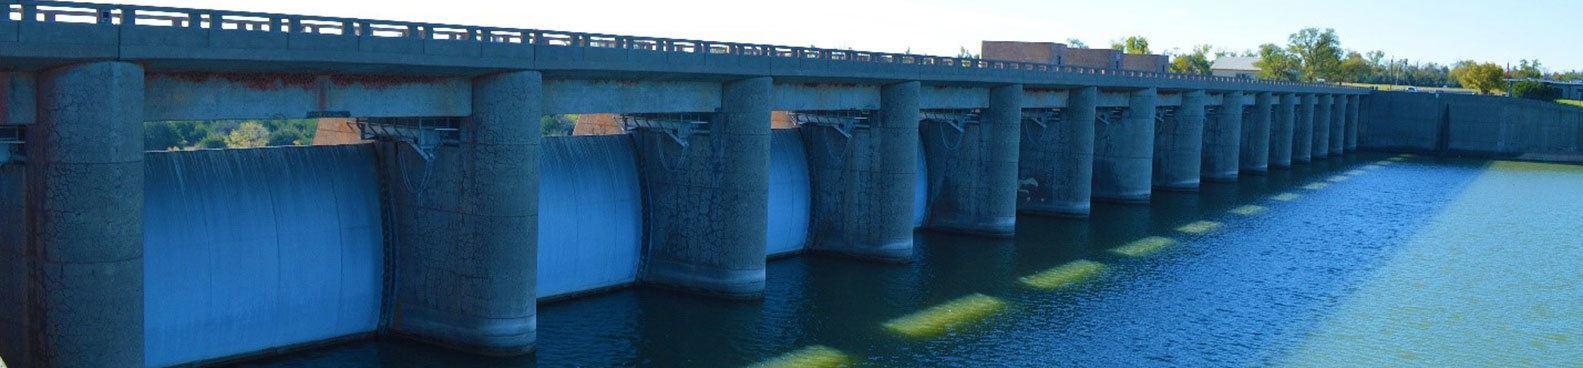 Canton Dam Sluice Gates Replacement